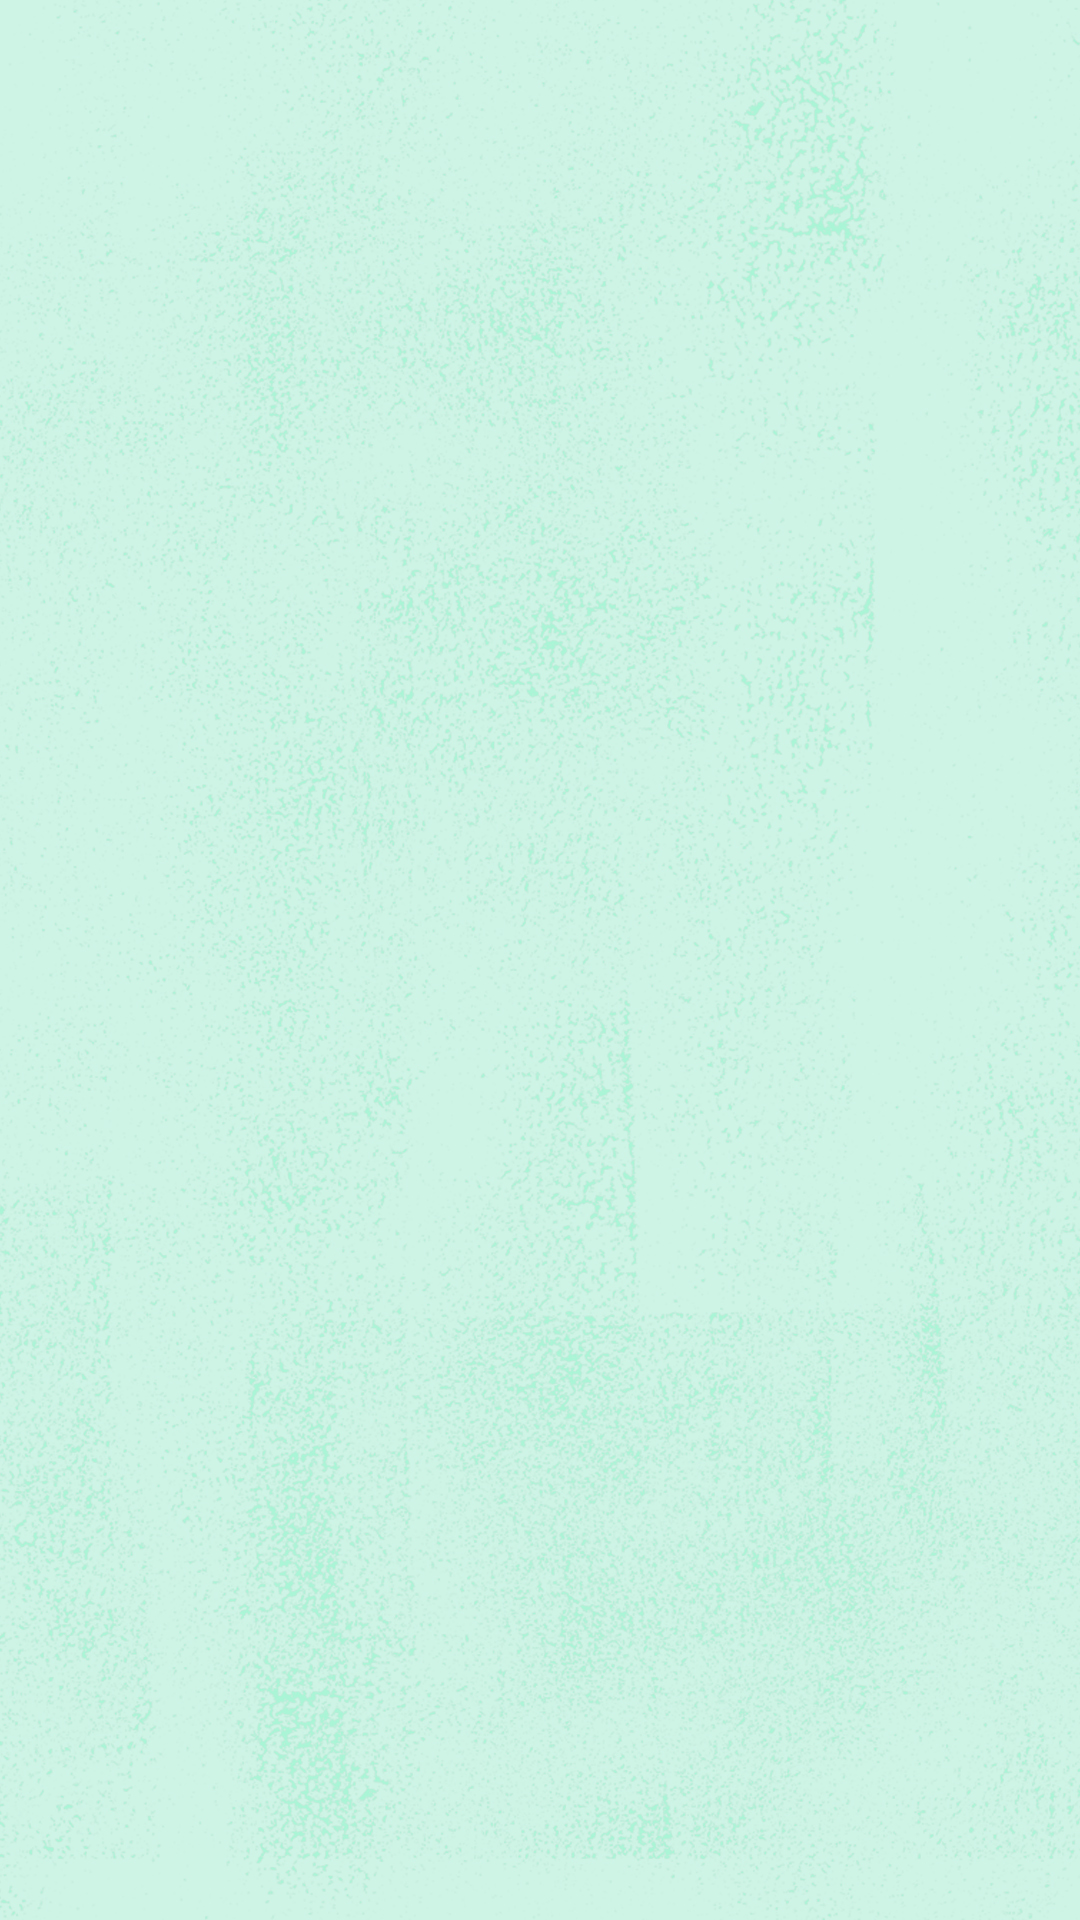 Create Iphone Wallpaper Quote May 2016 Cactus Calendar Wallpaper Sarah Hearts